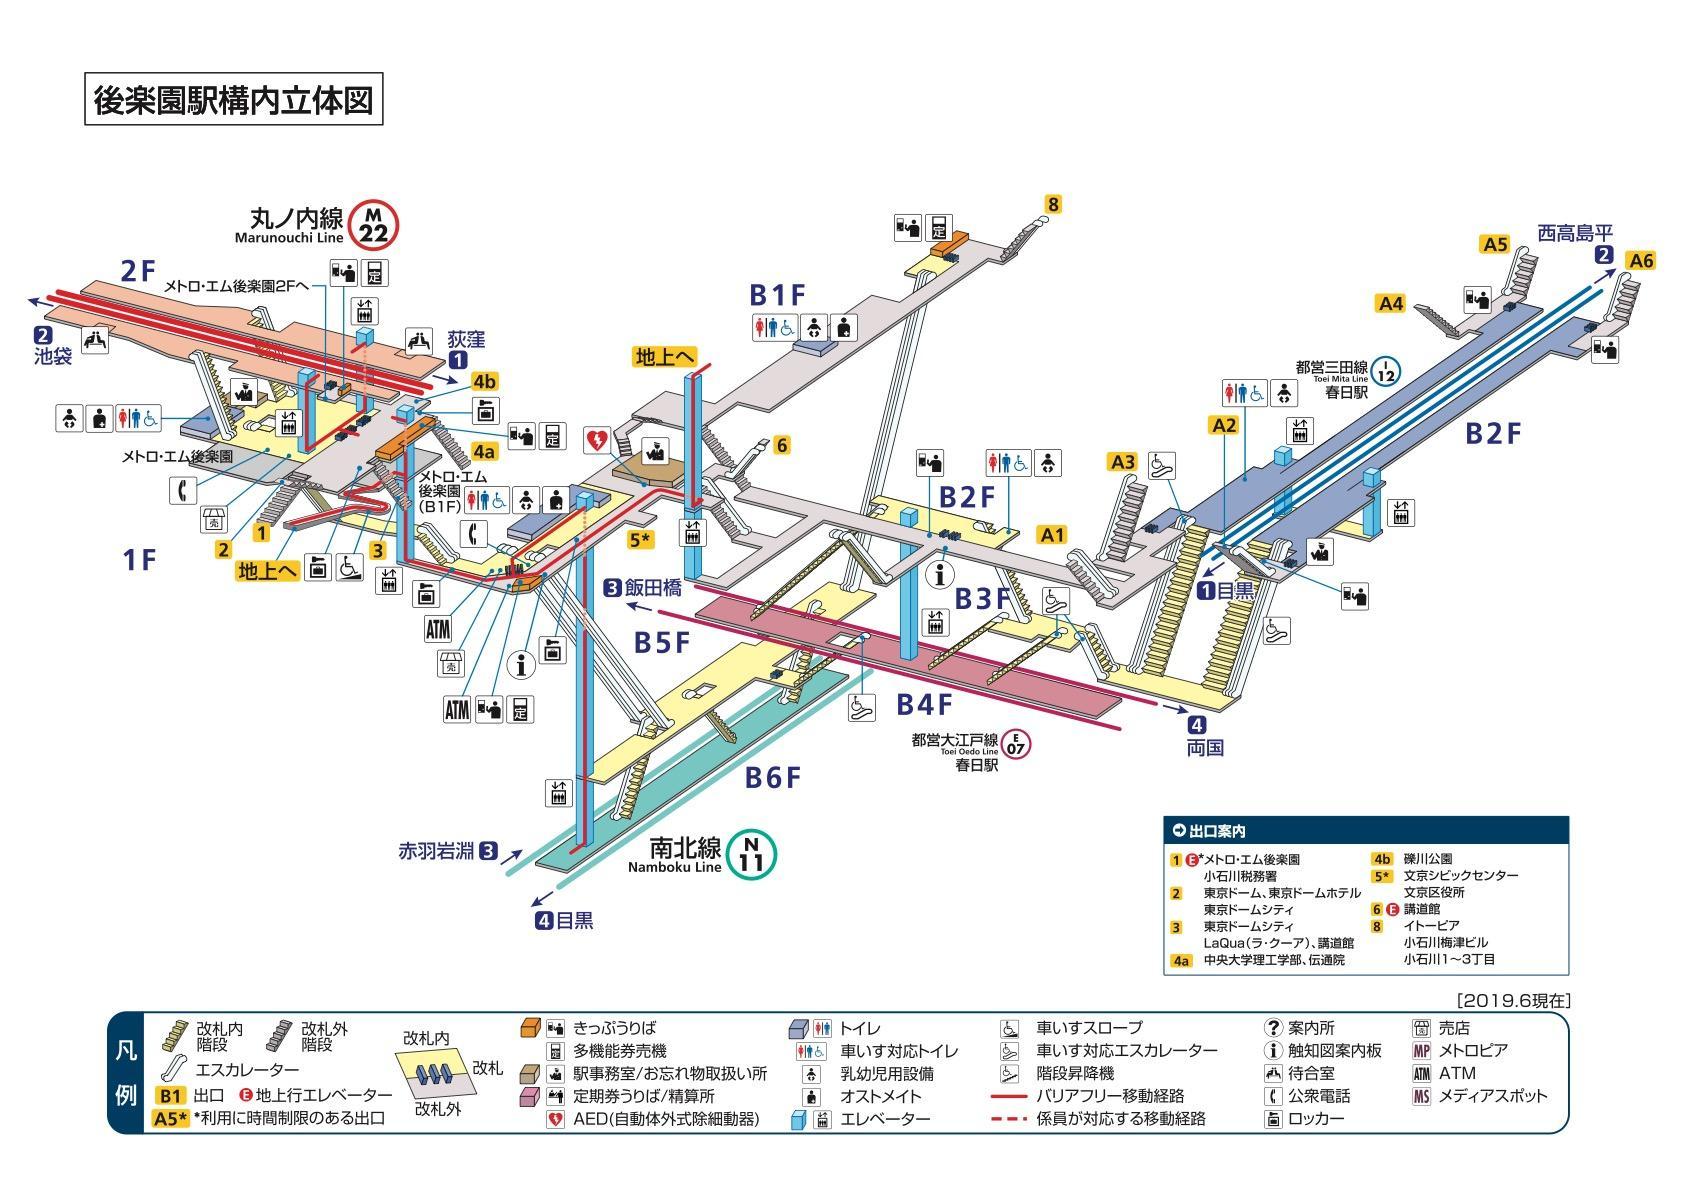 JR東京駅から地下鉄東京メトロ丸ノ内線に乗り換え|乗り場の行き方